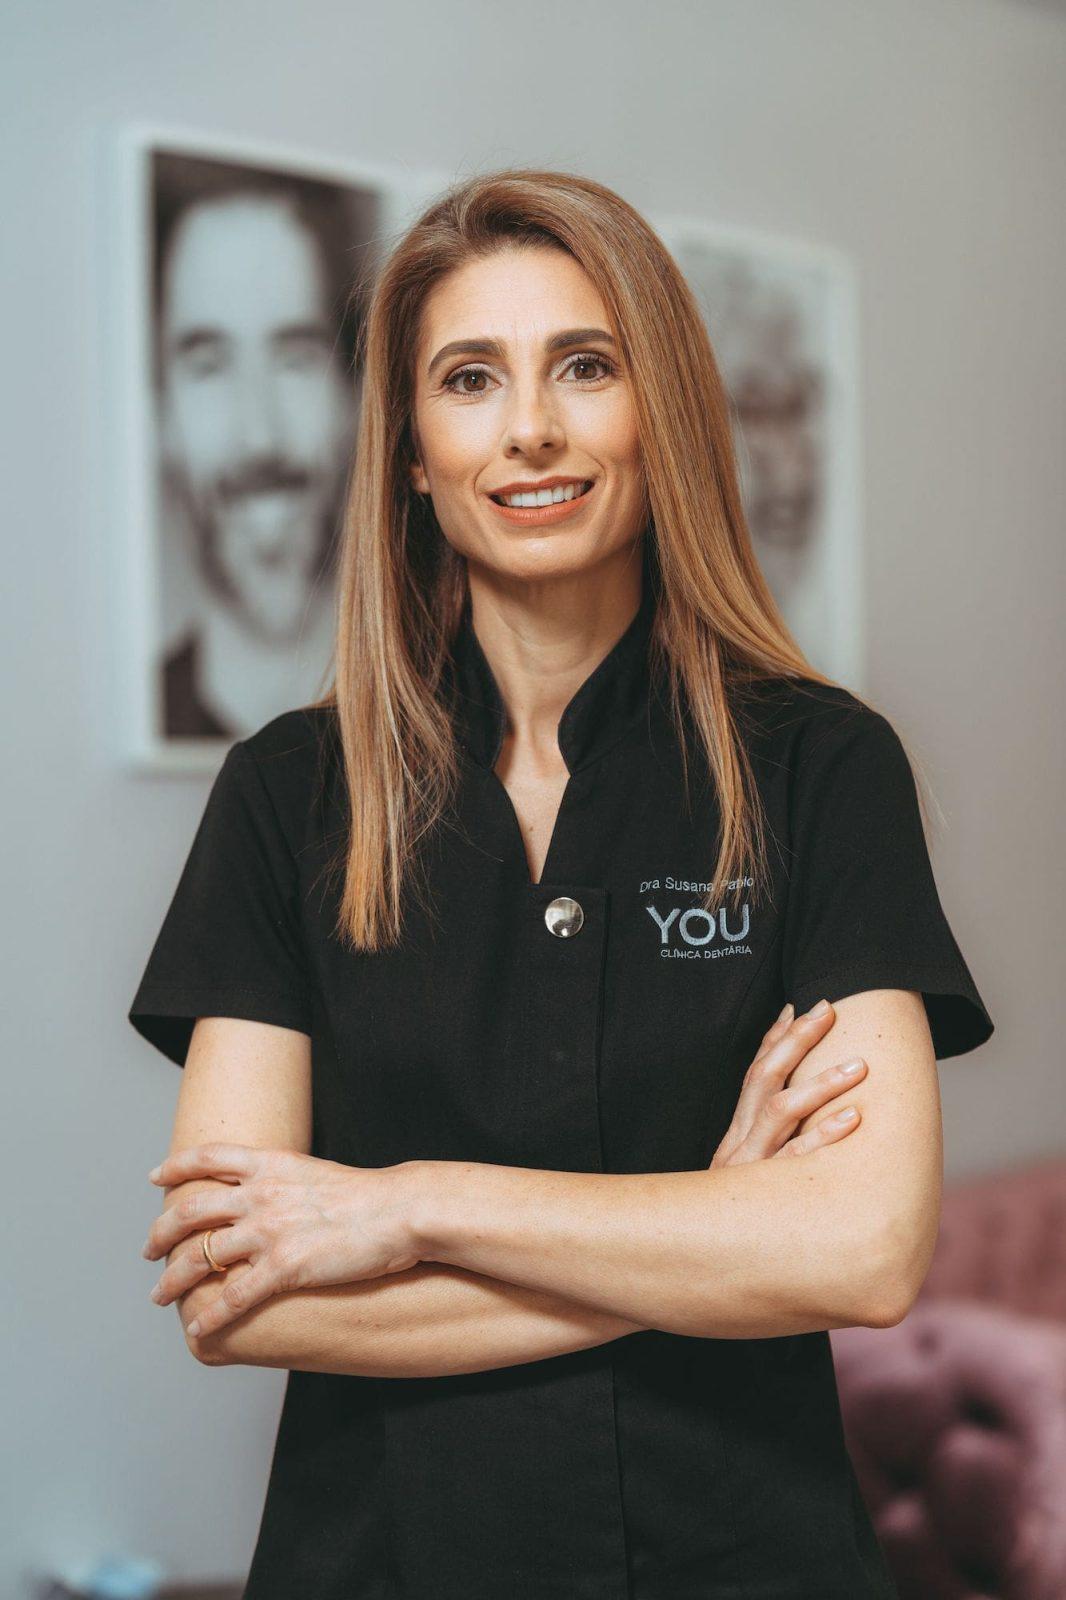 Dra. Susana Pablo